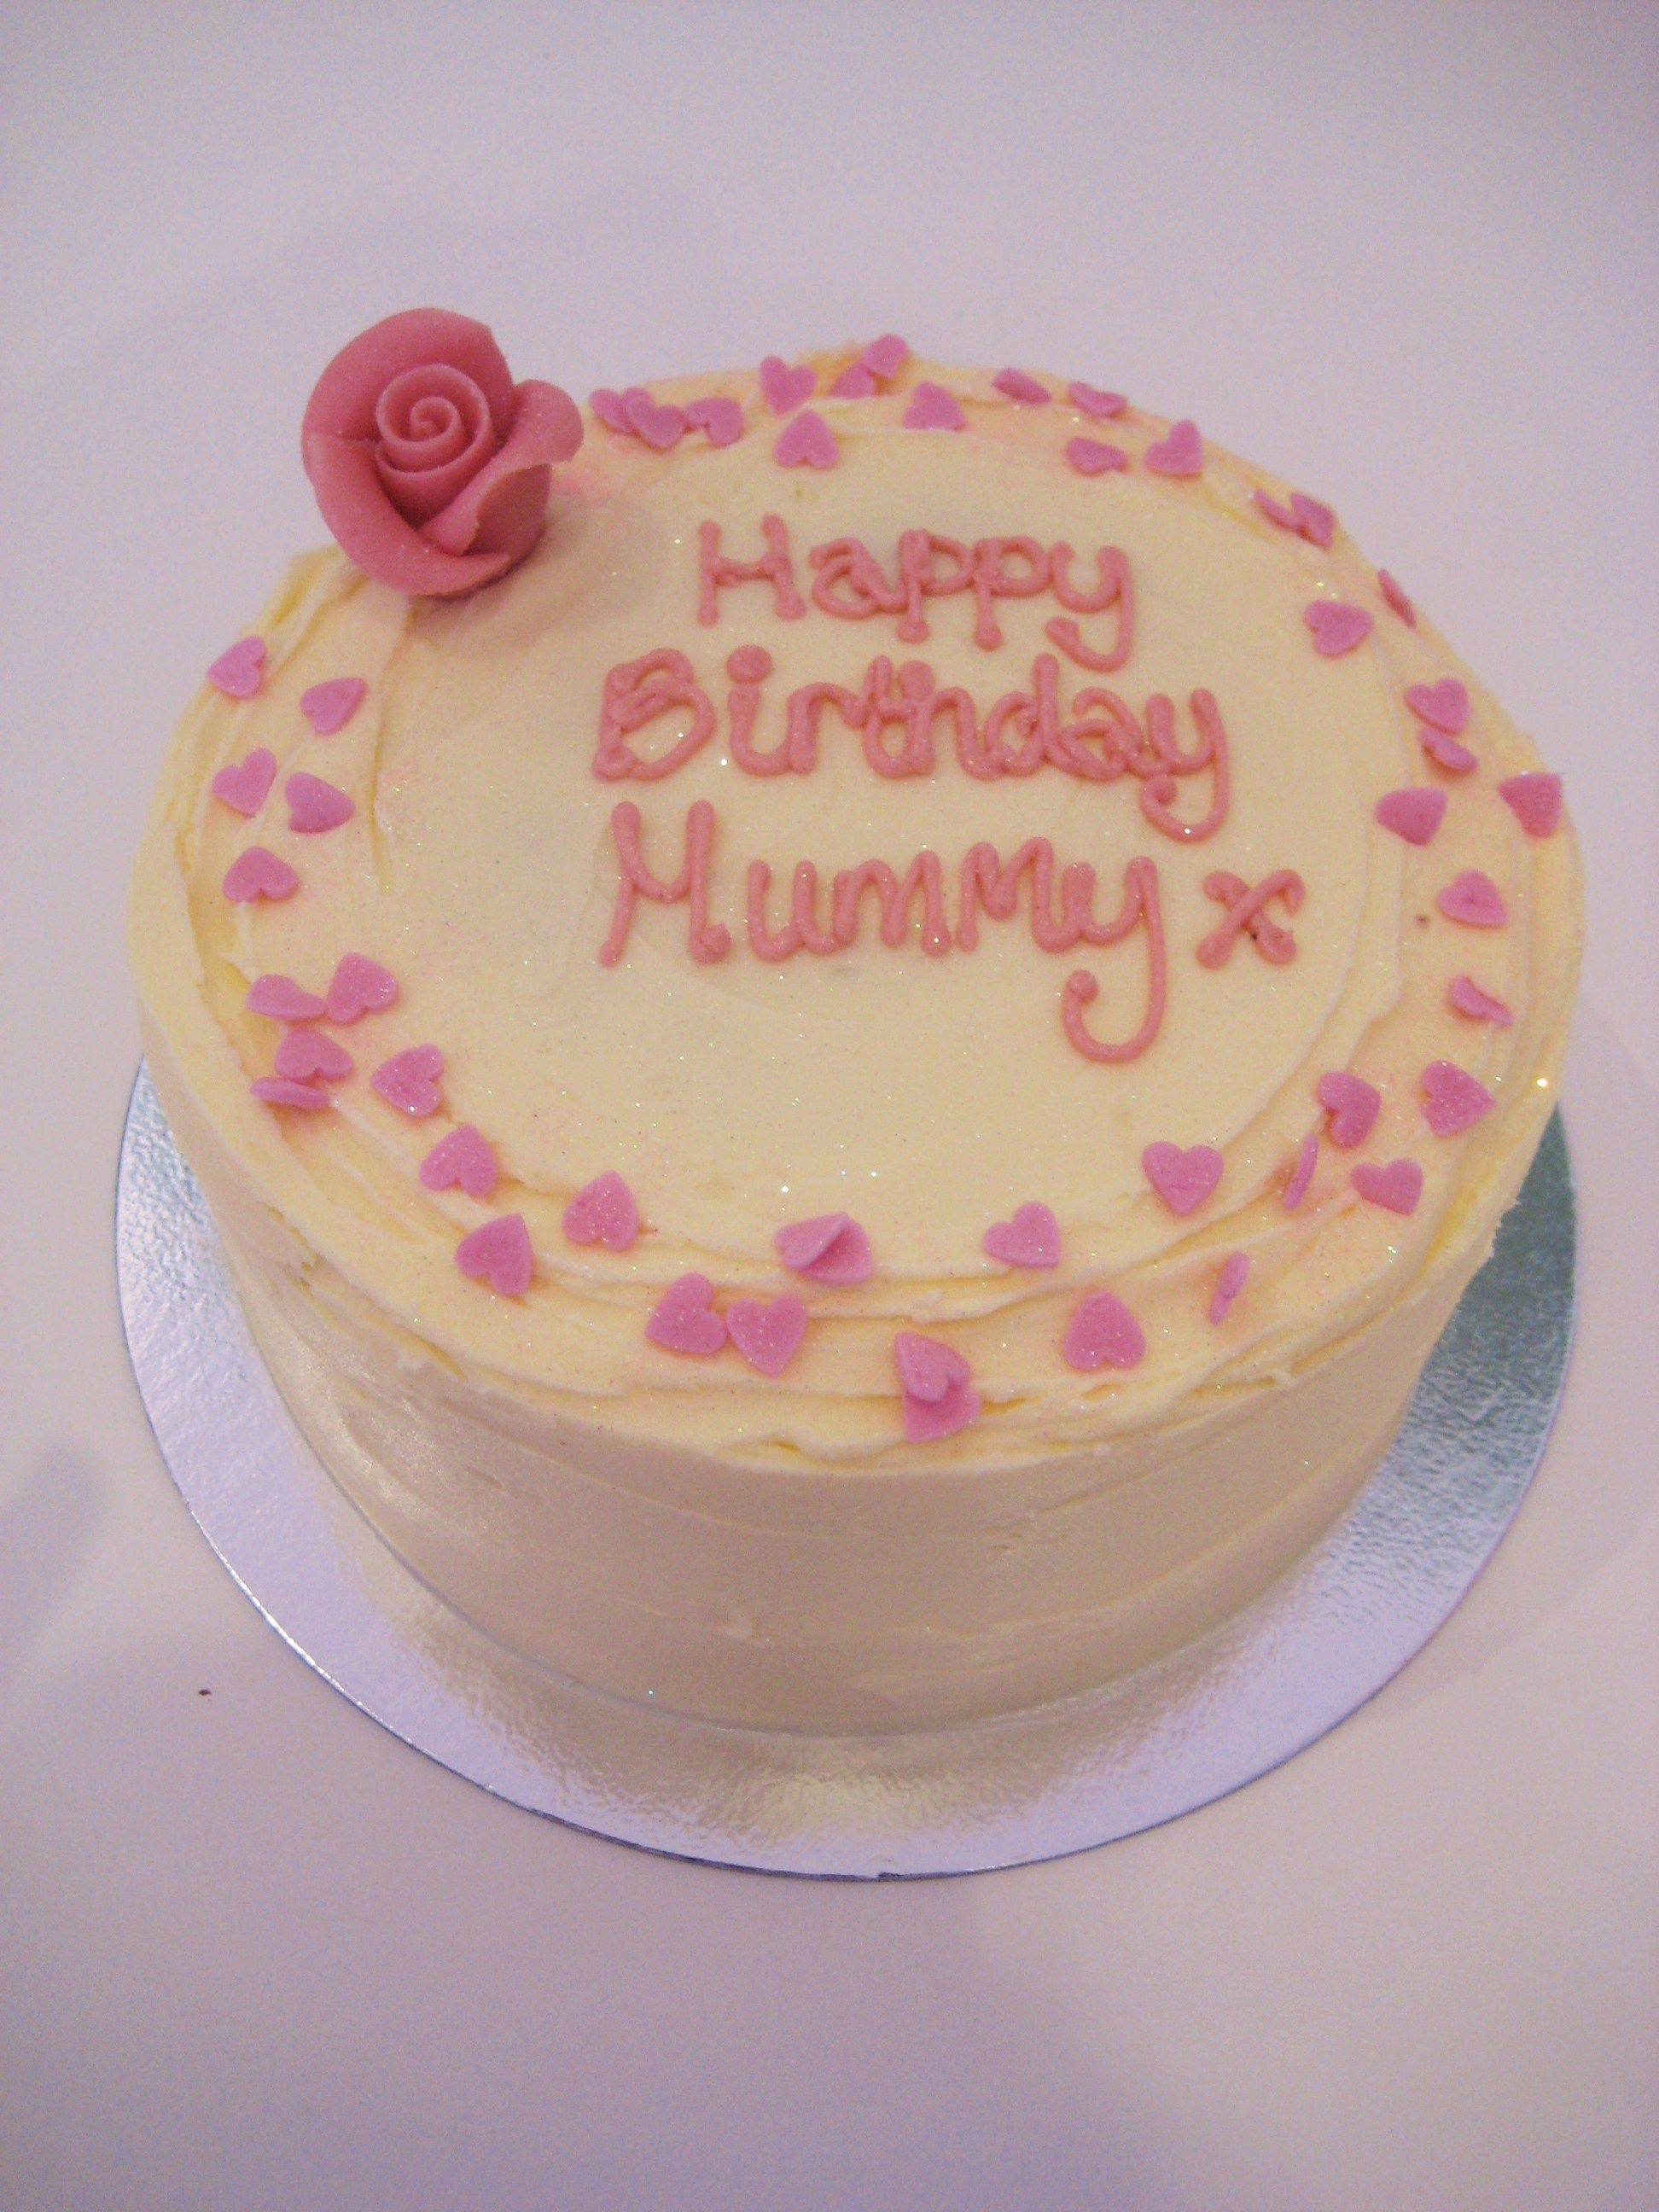 Traditional Birthday Cake 6 Inch Cakes Pinterest Brighton